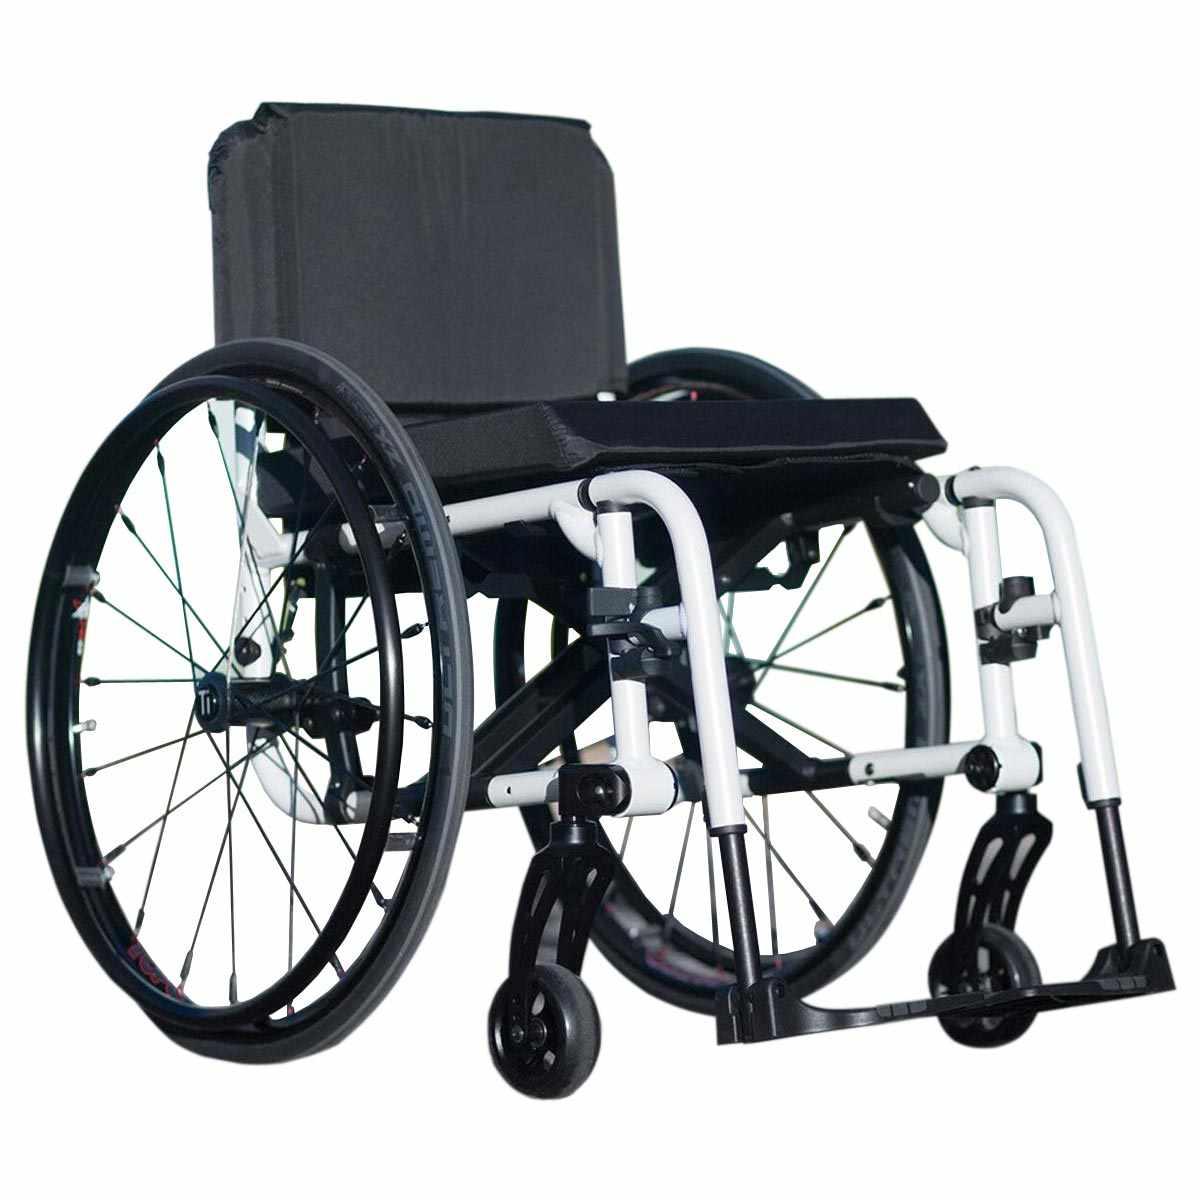 Tilite Aero X series folding ultralight wheelchair